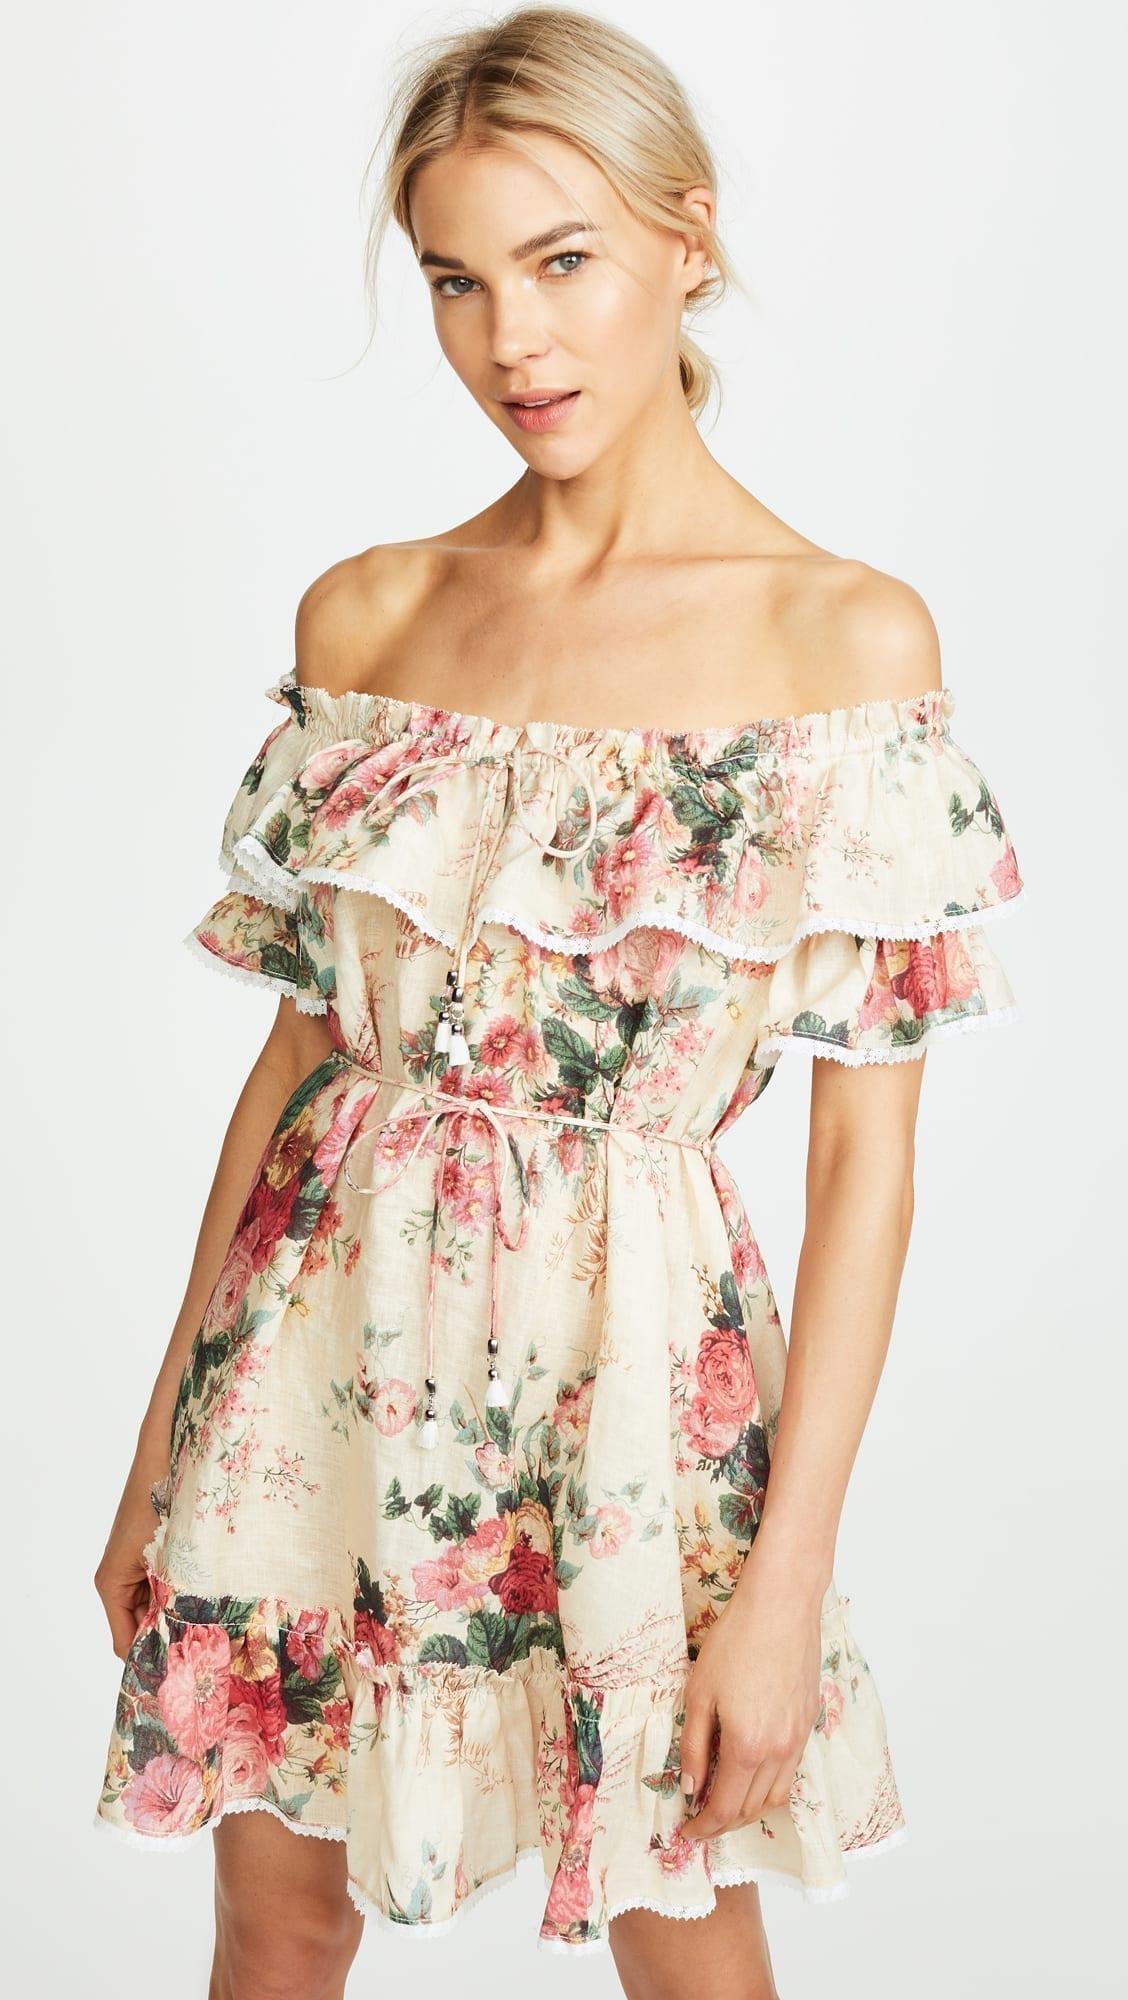 ZIMMERMANN Laelia Frill Tier Short Meadow / Floral Printed Dress